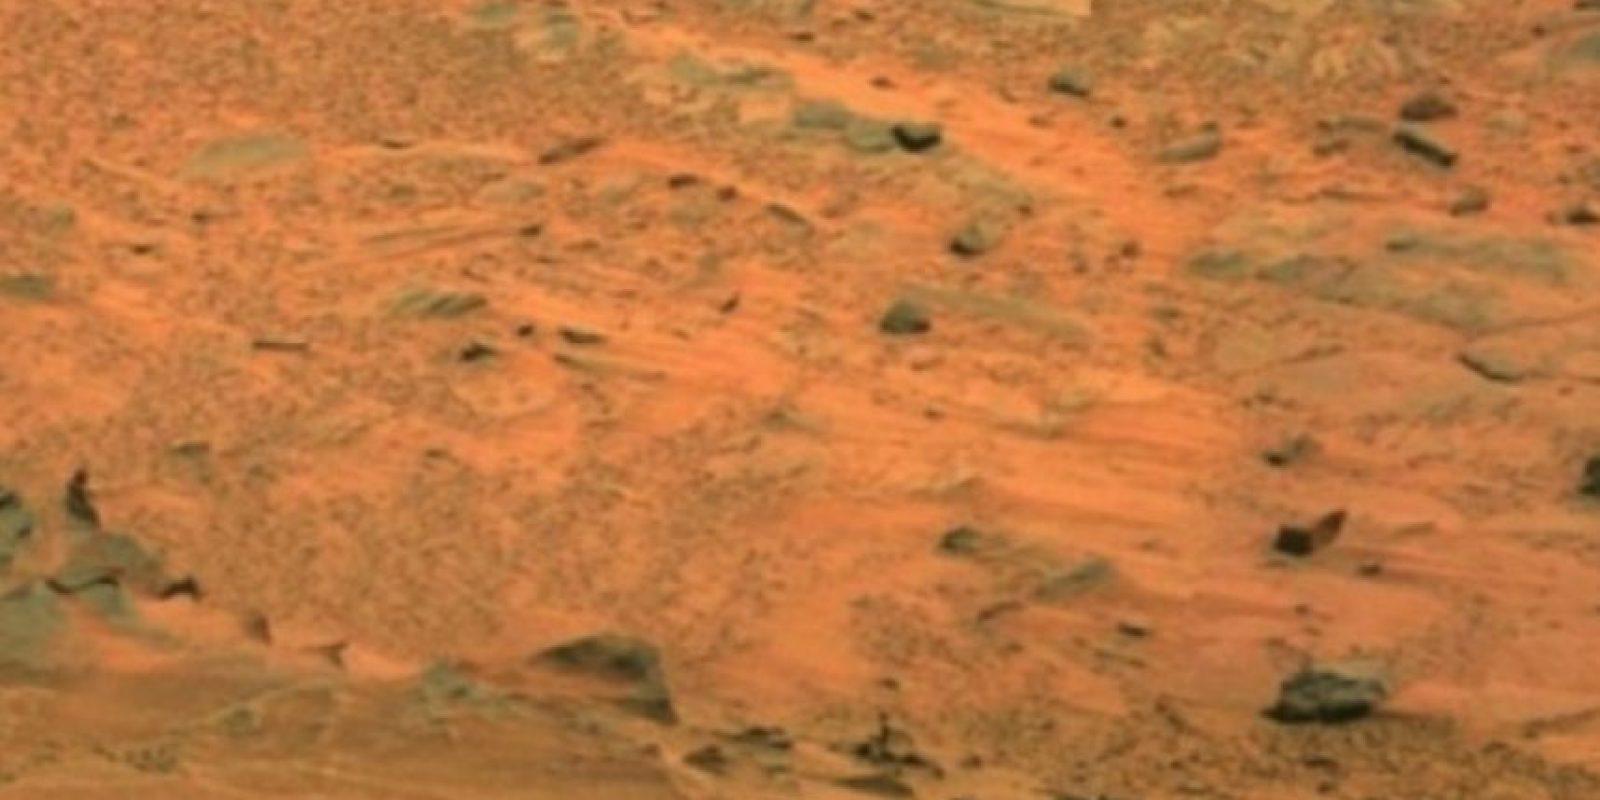 Fotografía original de la NASA, tomada por el explorador Spirit Foto:Original http://photojournal.jpl.nasa.gov/jpeg/PIA10214.jpg